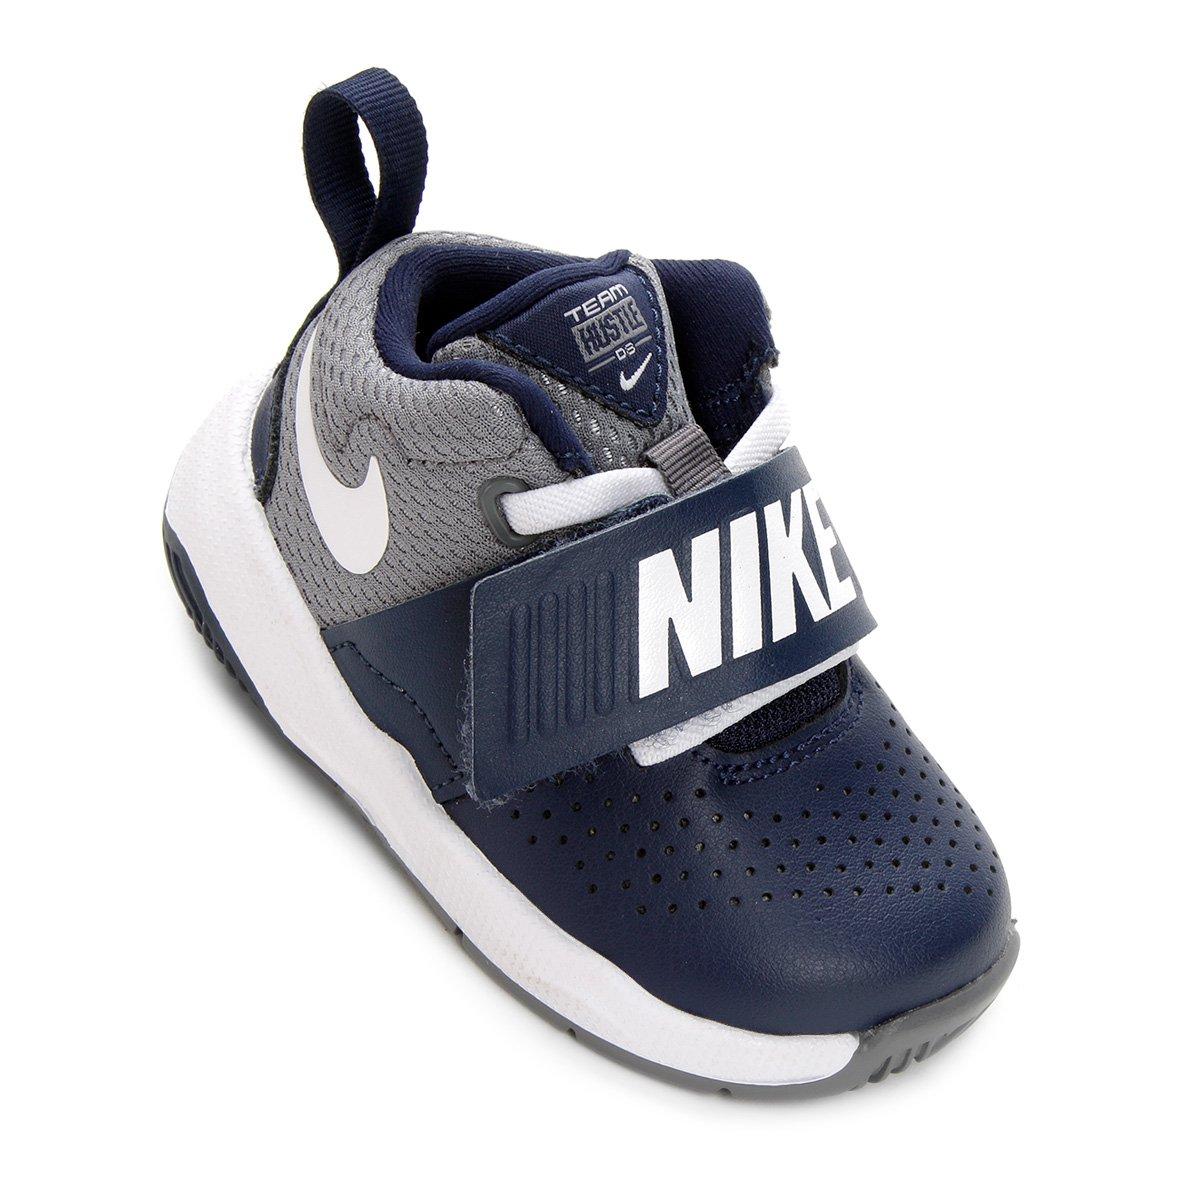 a257caa52cd Tênis Infantil Couro Nike Team Hustle D Masculino - Azul e Cinza - Compre  Agora